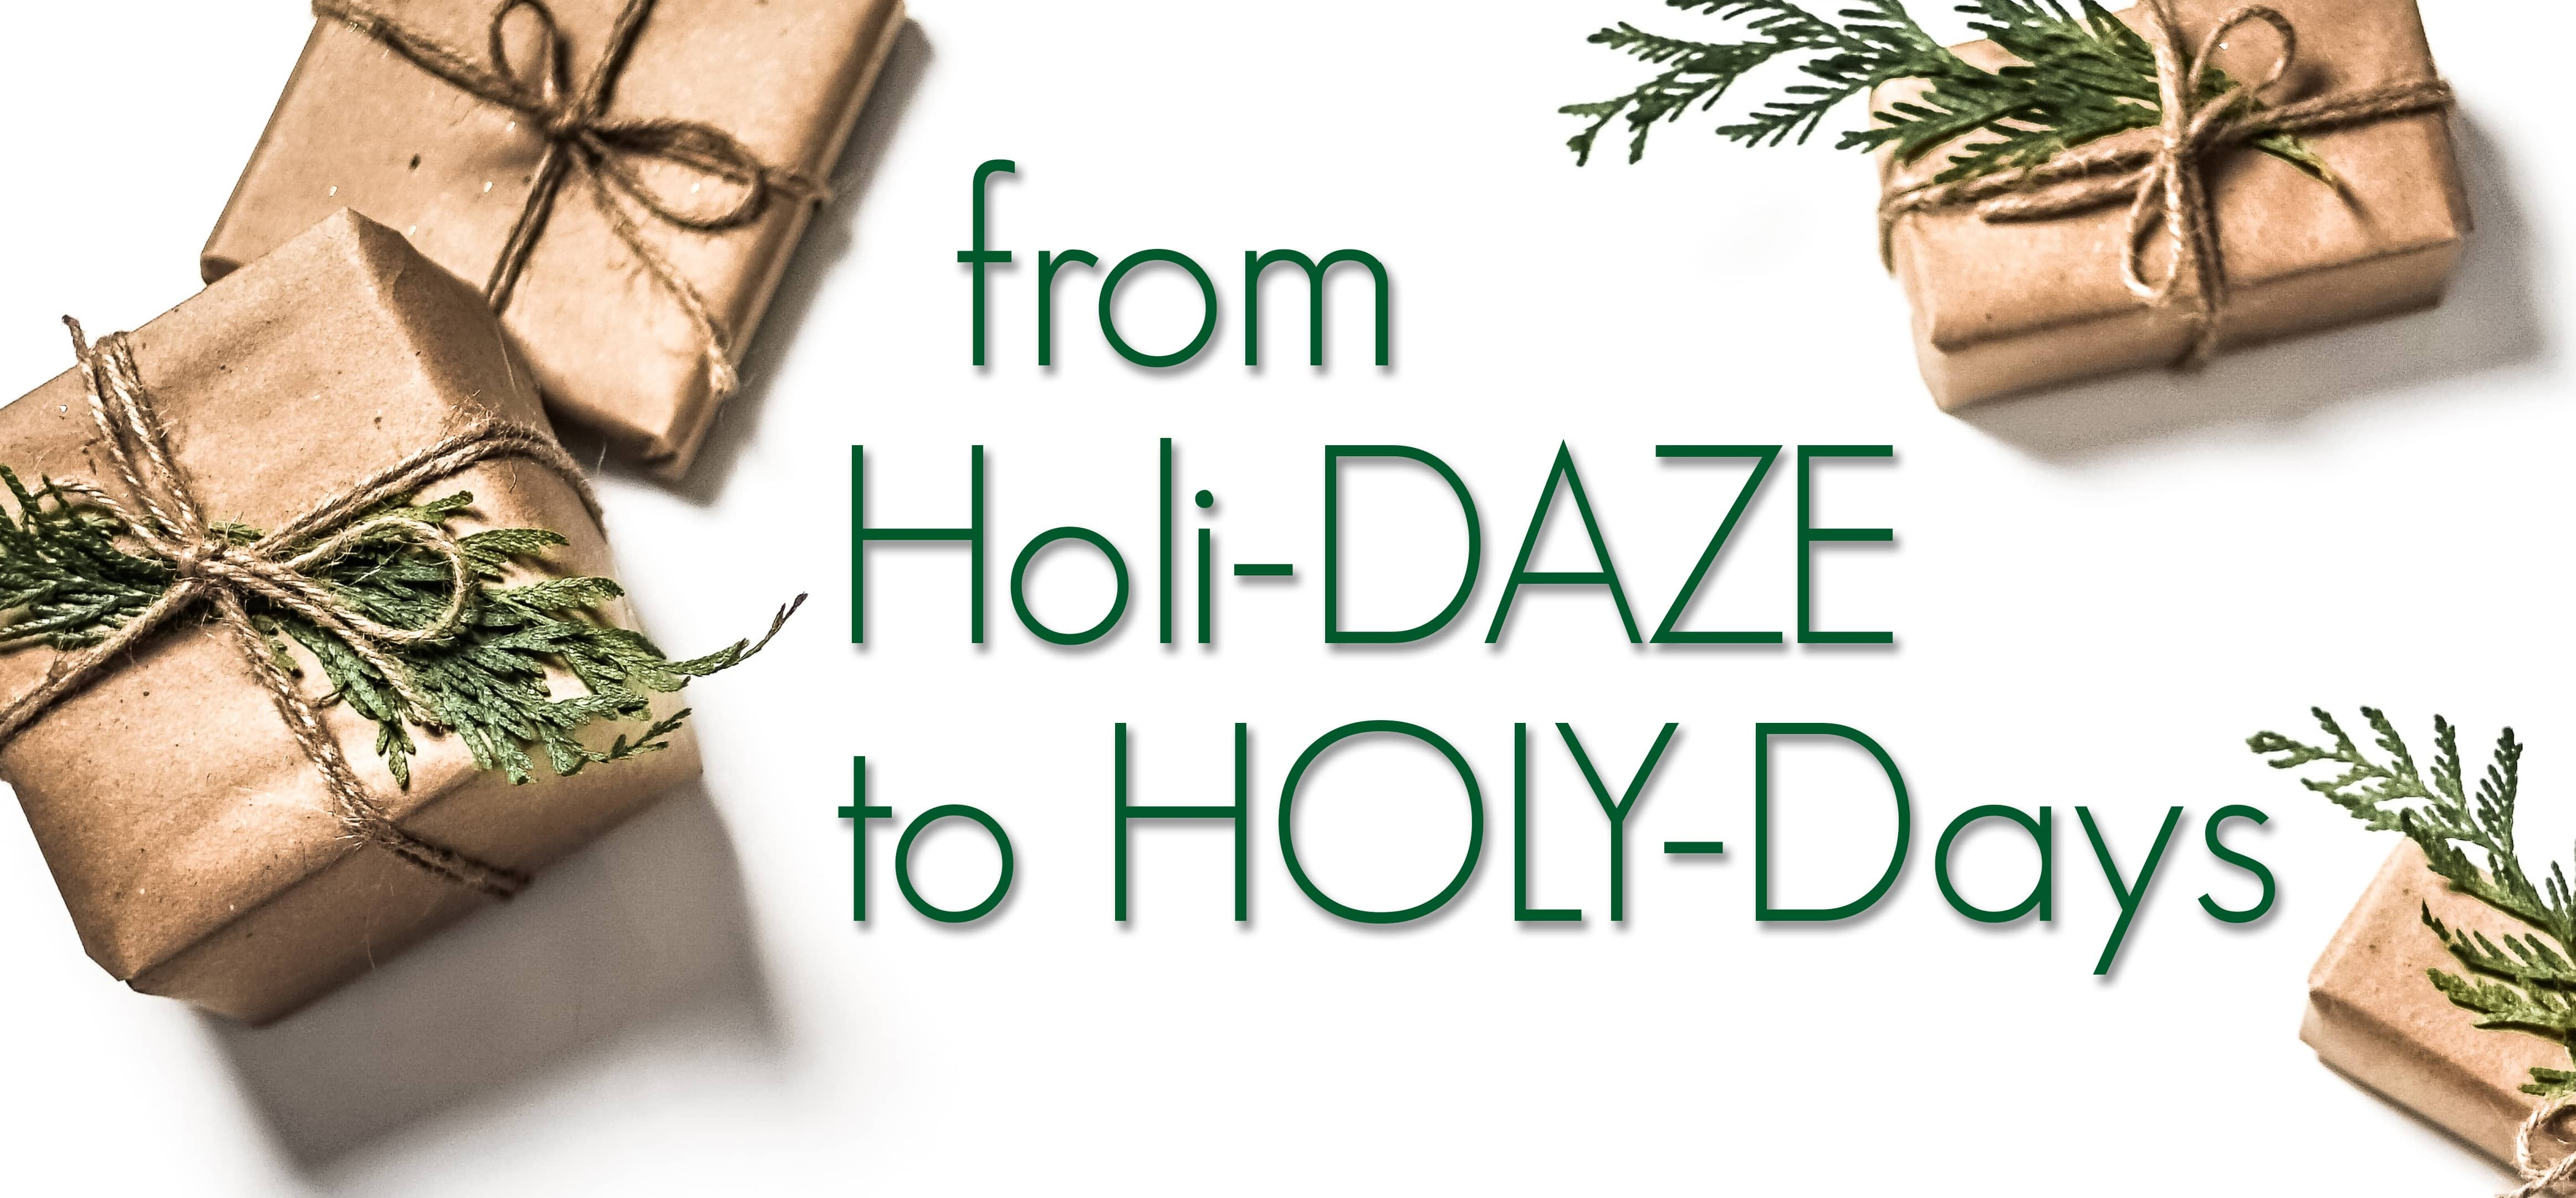 From Holi-Daze To Holy-Days